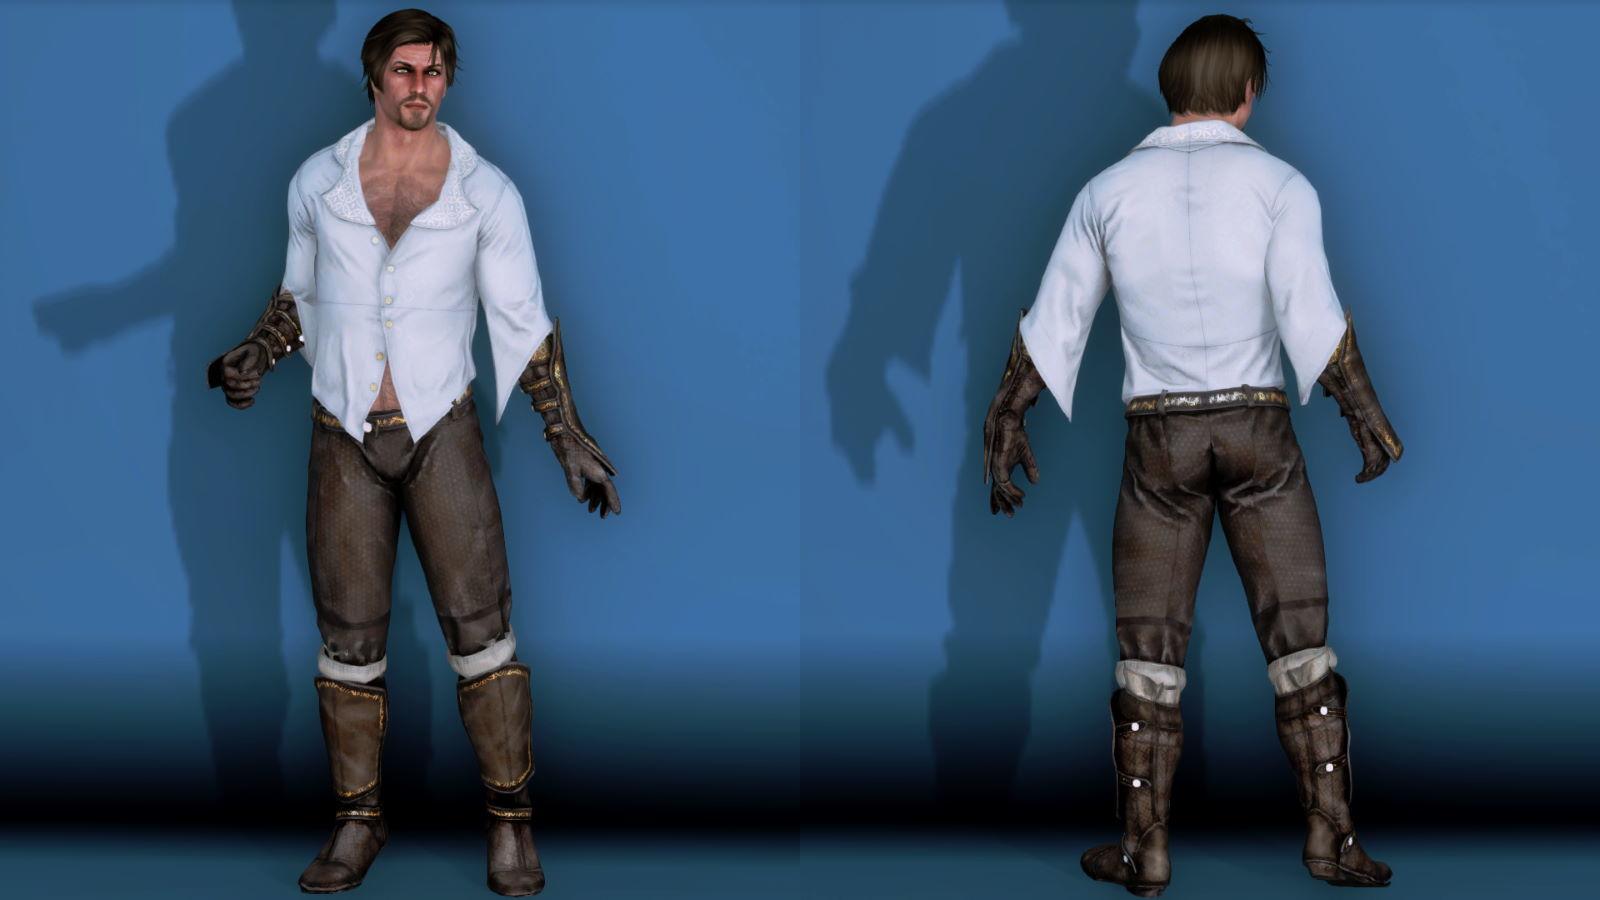 RuggedRogueSSE 531-1 Pose Fu-Ba-M Blouse Trouser 2